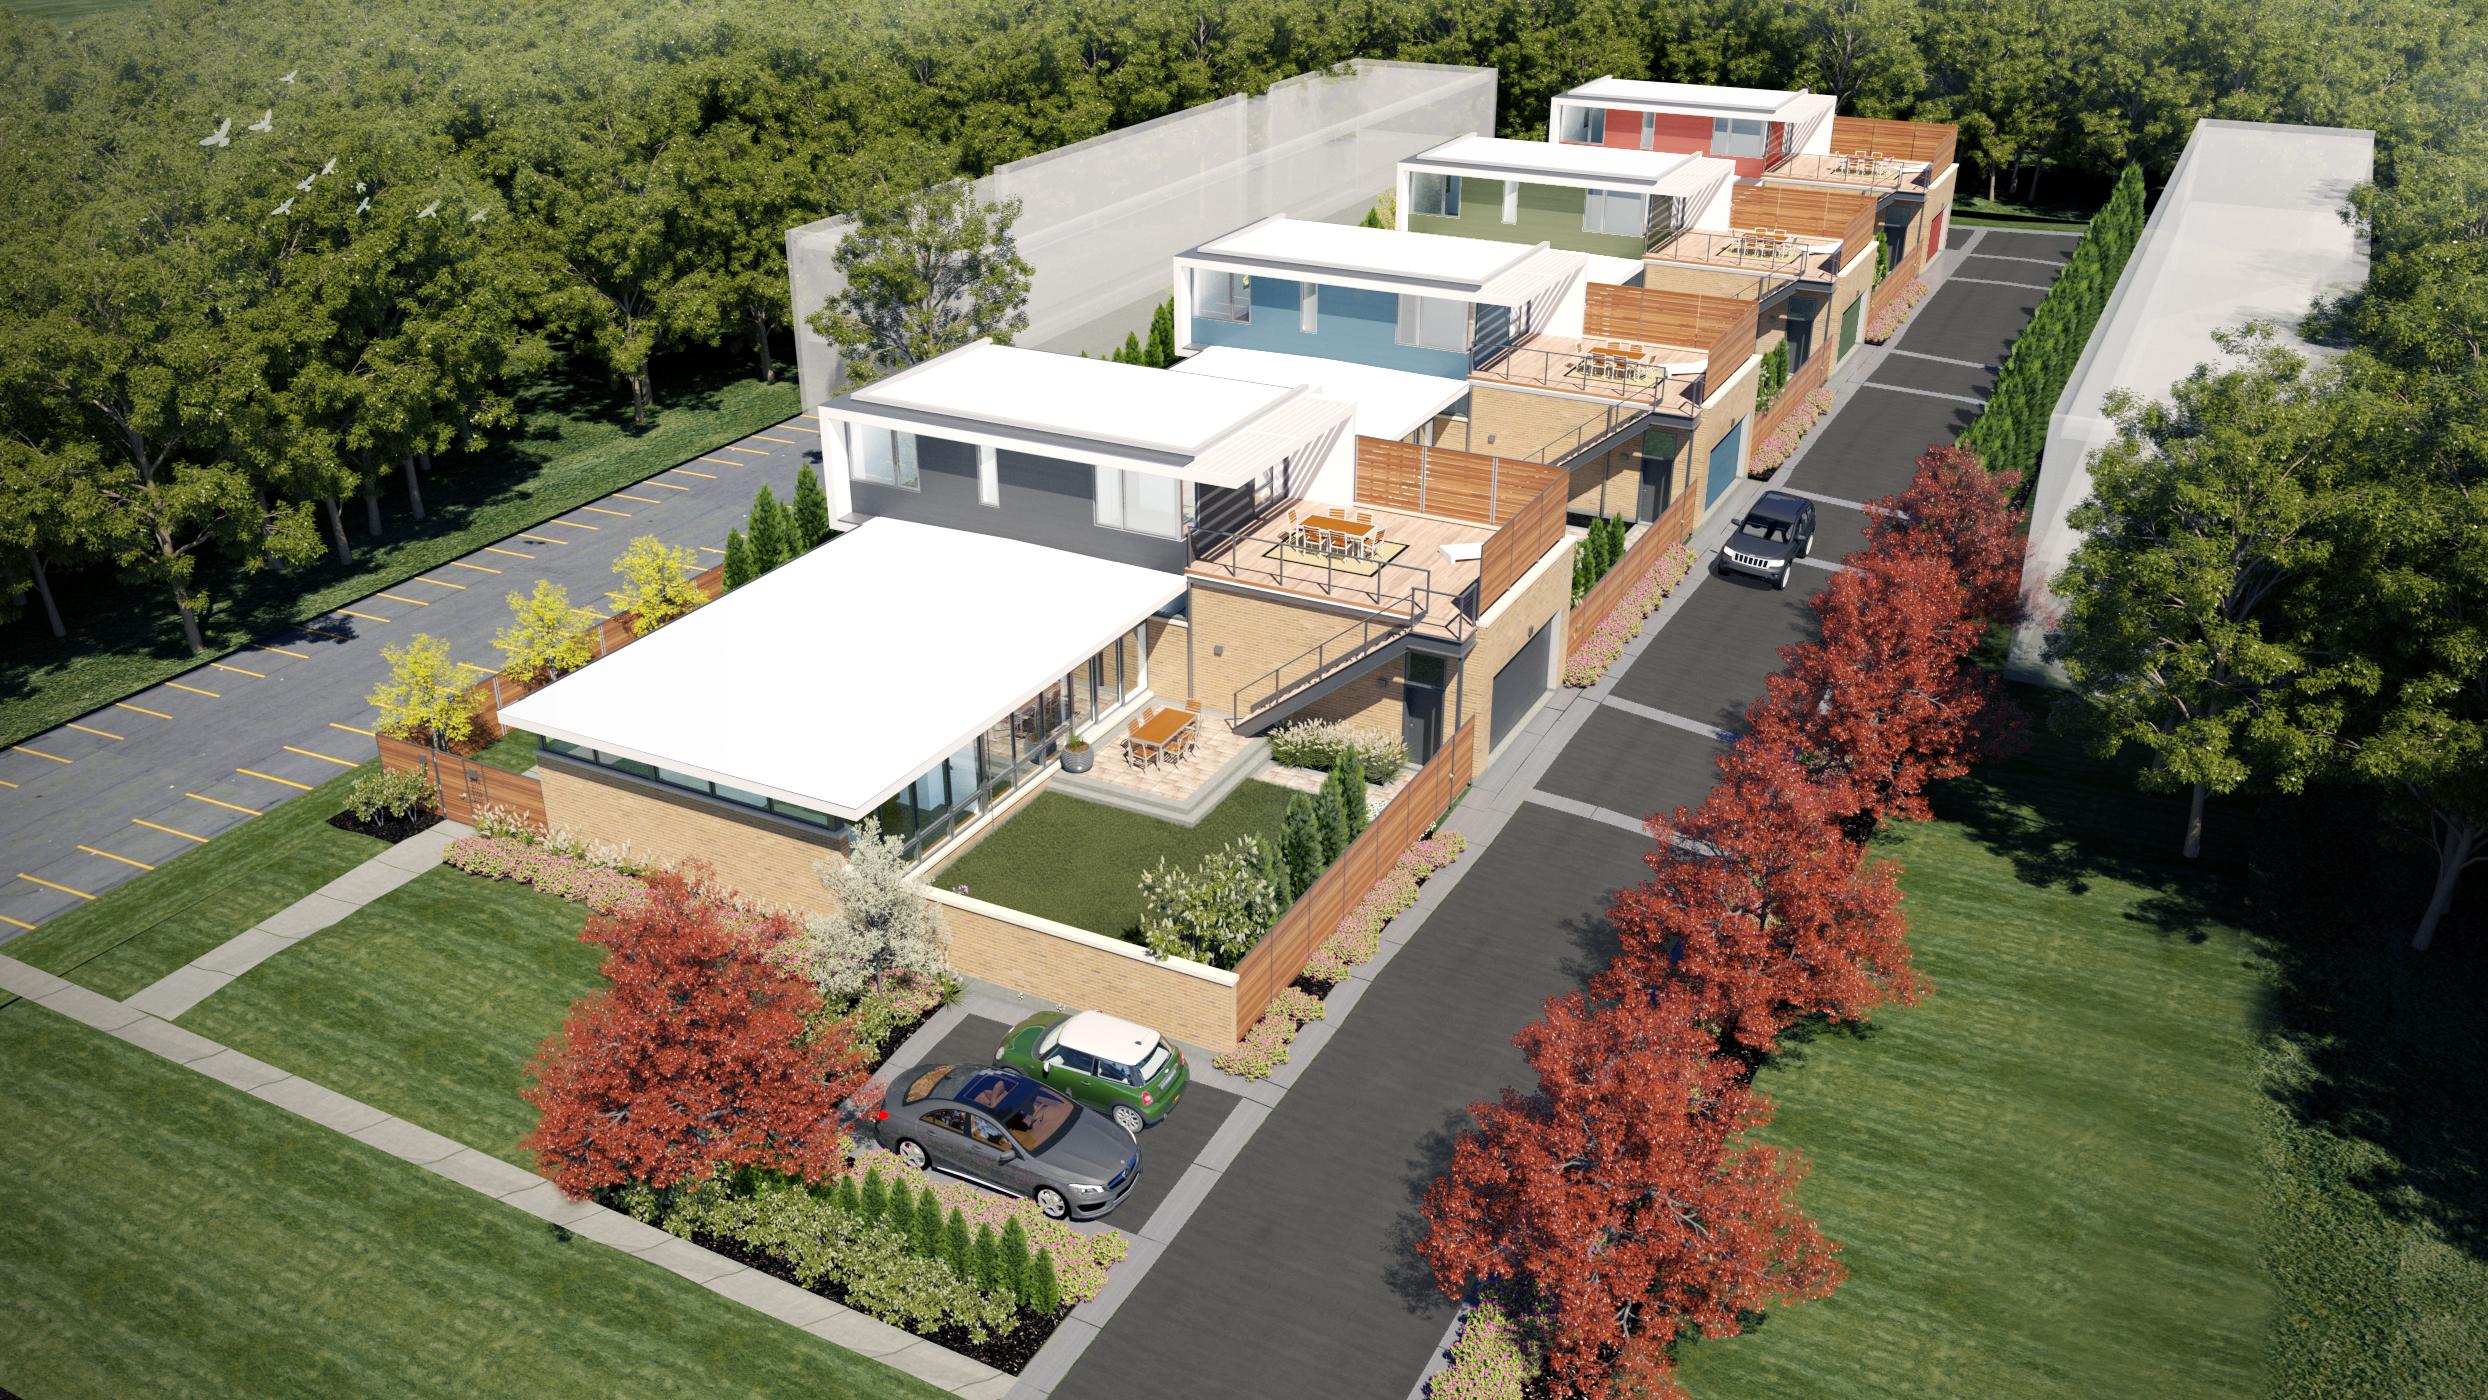 Highland park modern residential architect nicholas for Modern view decking